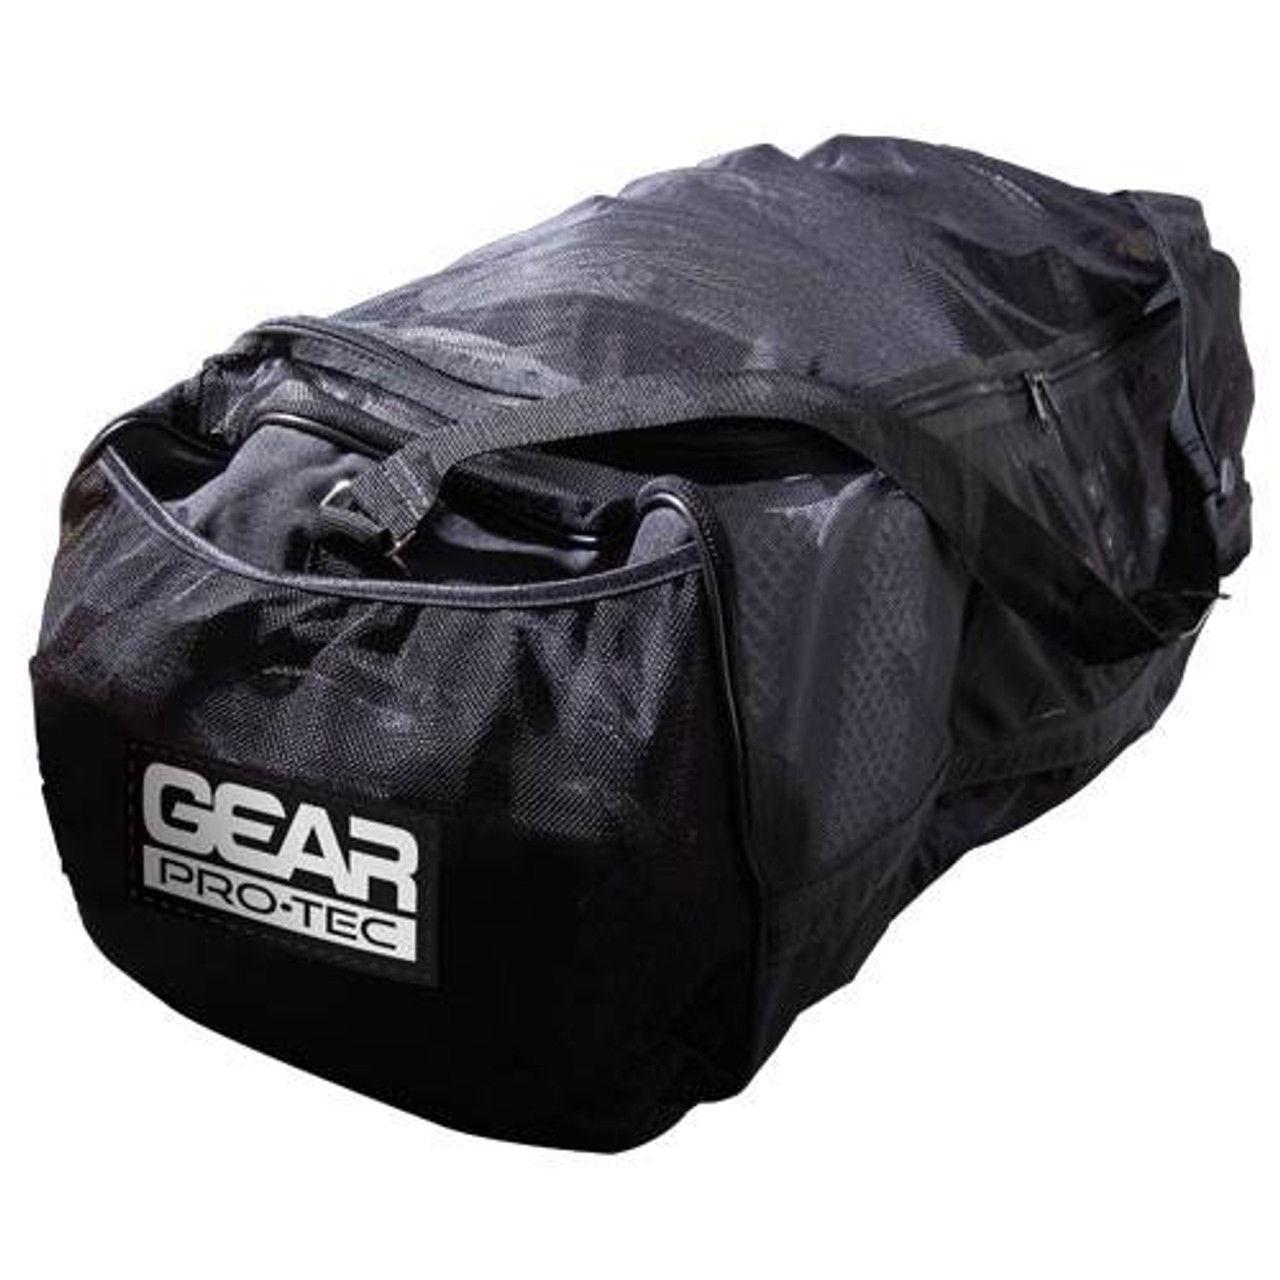 Z-Cool/Gear Pro-Tec Football Equipment Bag